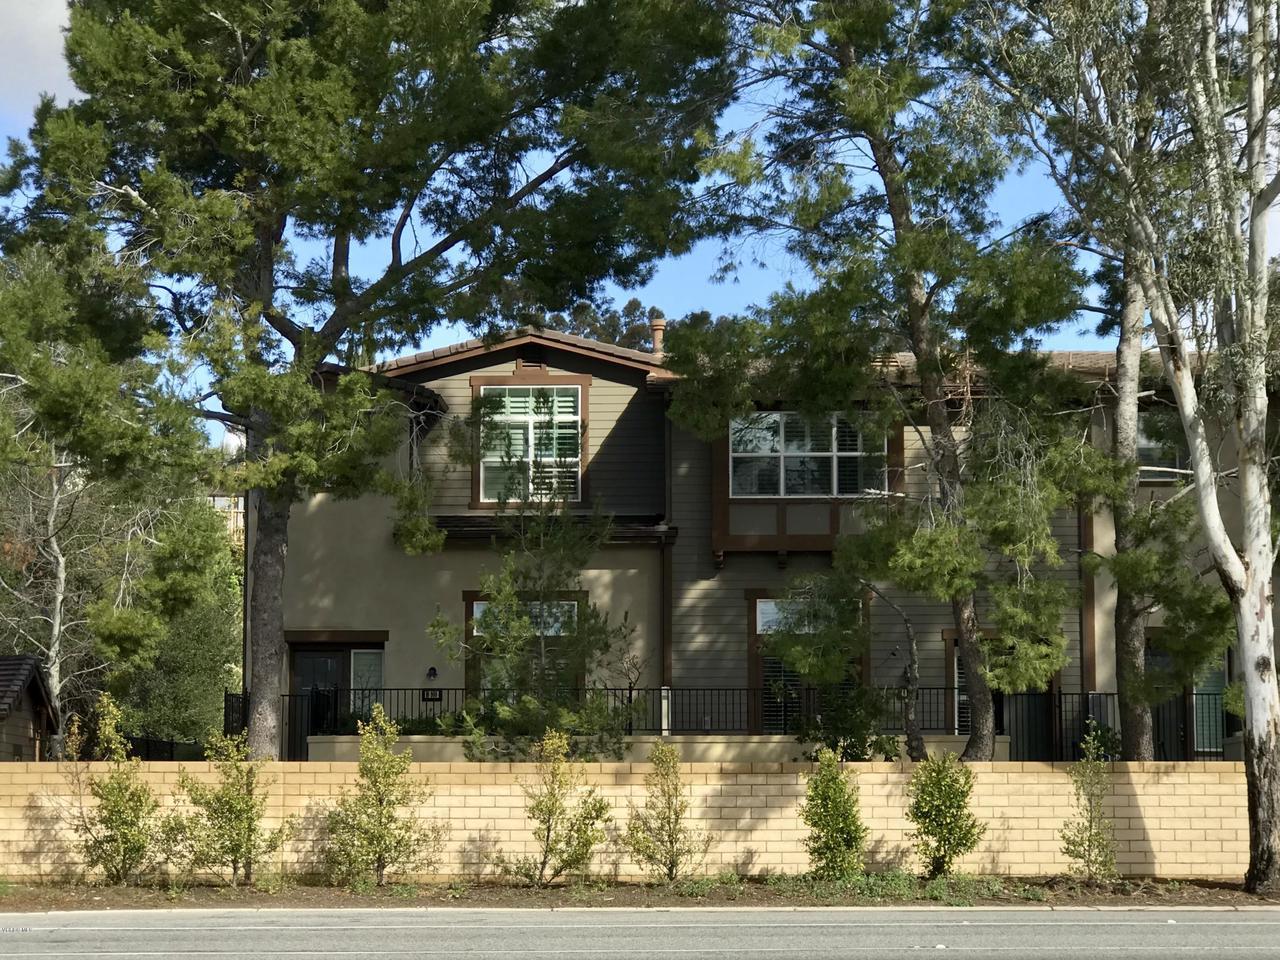 692 TENNIS CLUB, Thousand Oaks, CA 91360 - IMG_2649